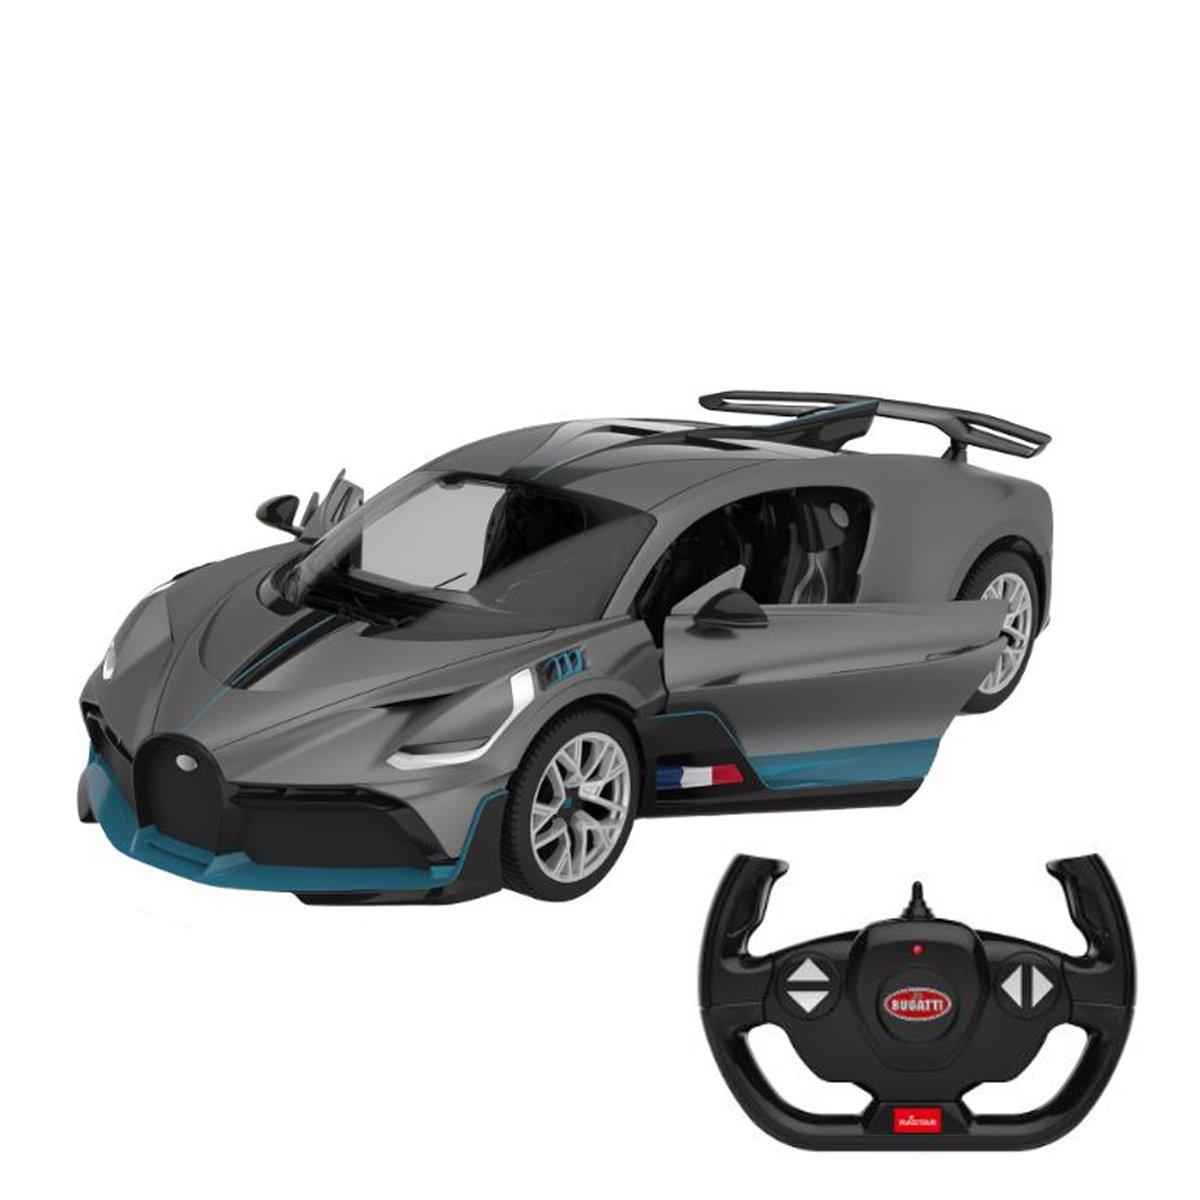 Masinuta cu telecomanda, Rastar, Bugatti Divo, 1:14